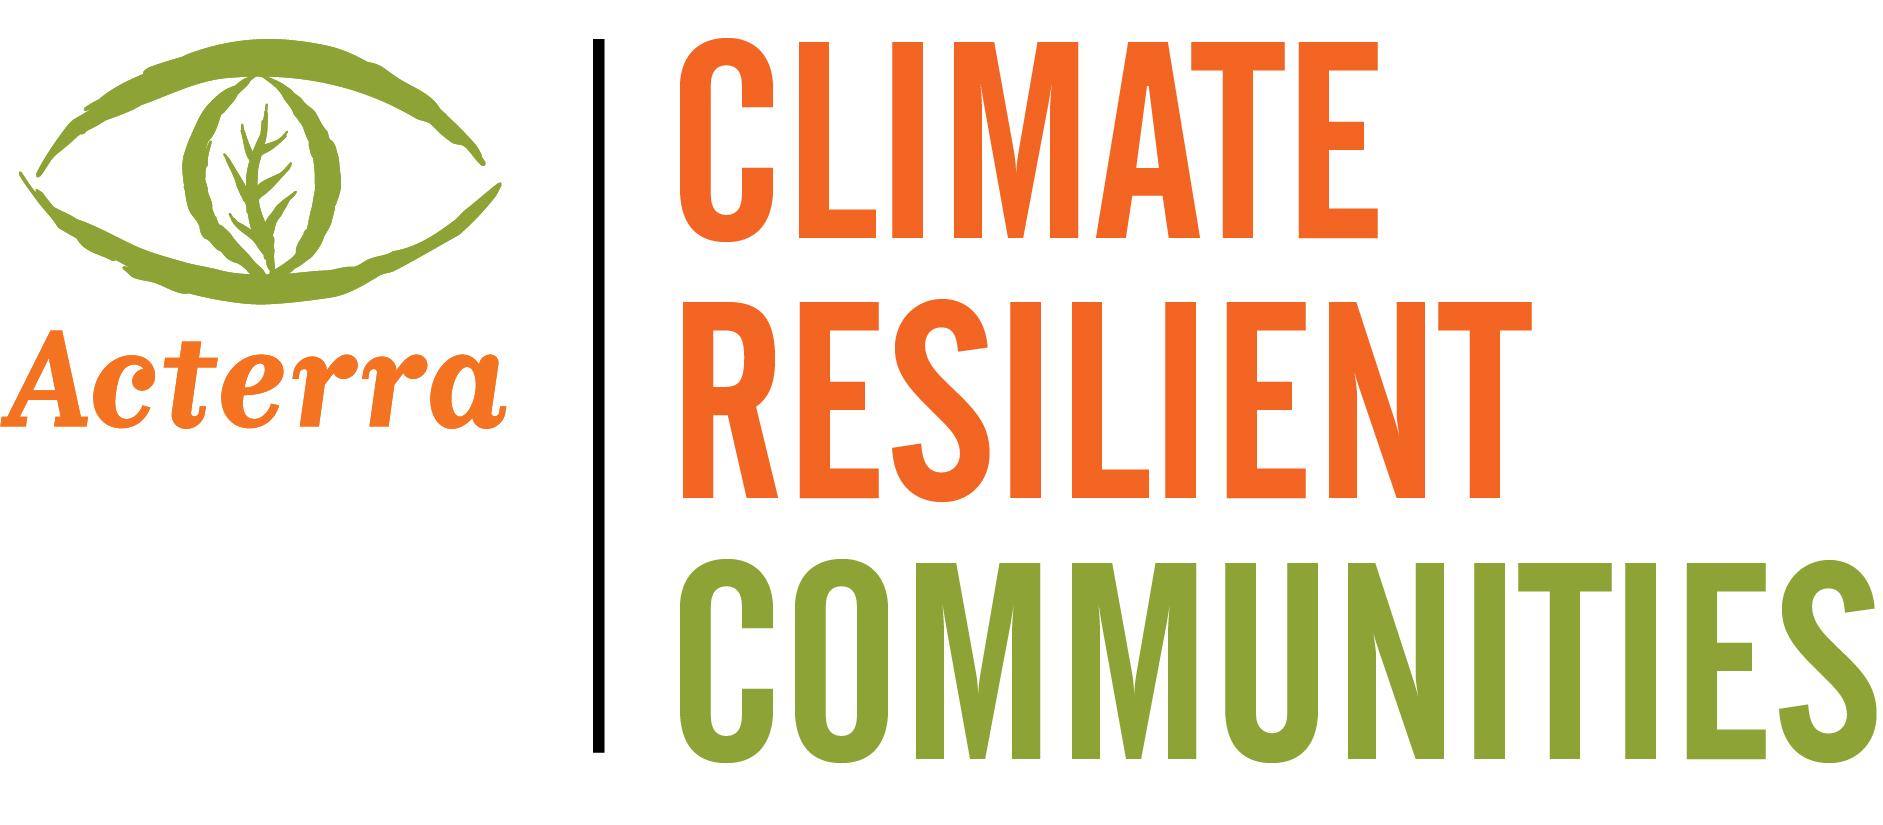 Climate Resiliant Communities logo 2018.jpg